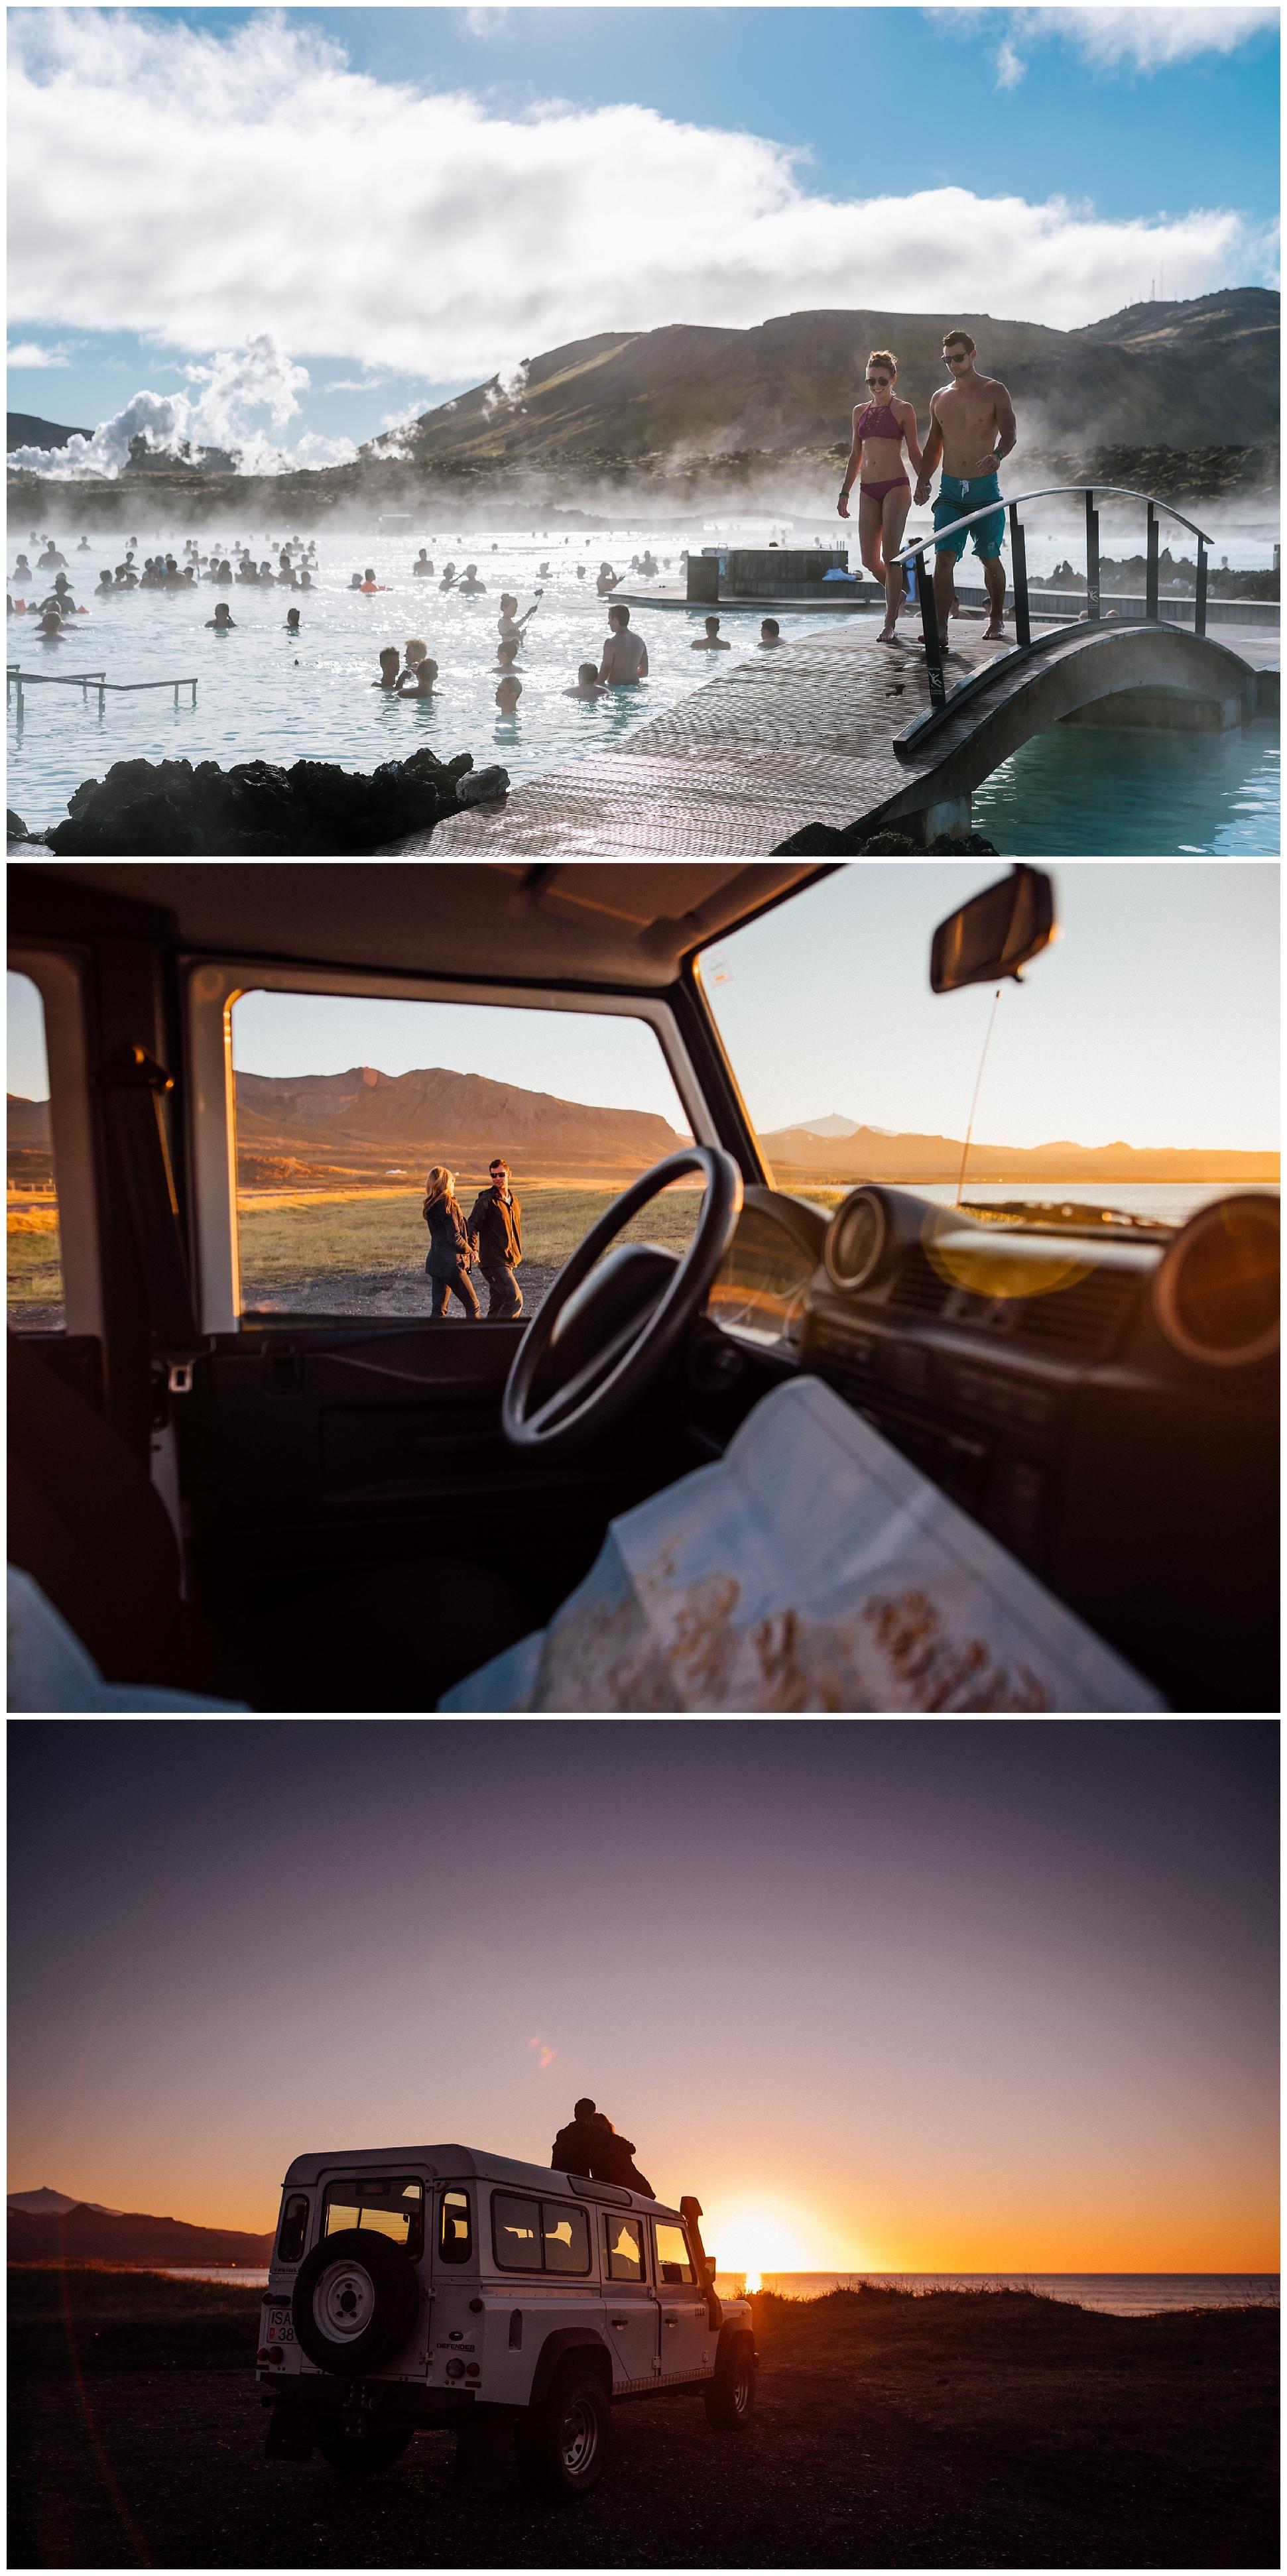 Ashlee-hamon-photography-year-in-review-2016-travel-wanderlust-vsco-adventure-wedding_0059.jpg